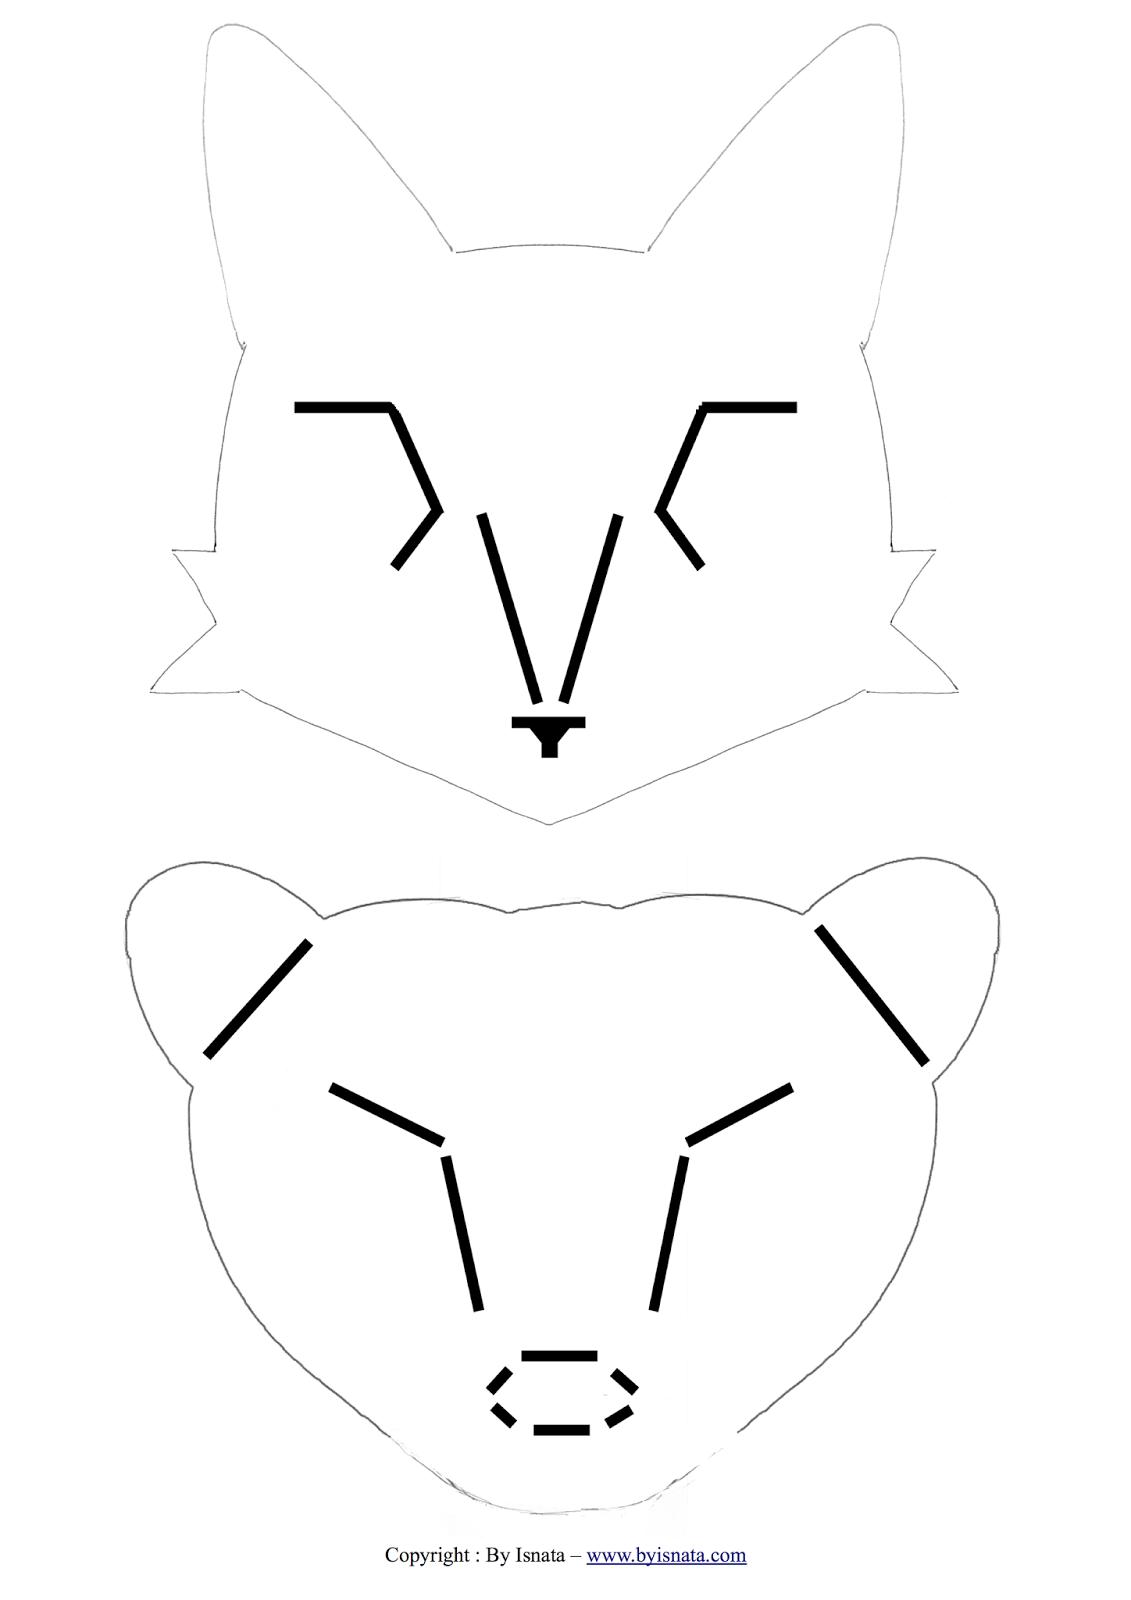 http://www.fichier-pdf.fr/2014/11/29/animaux/